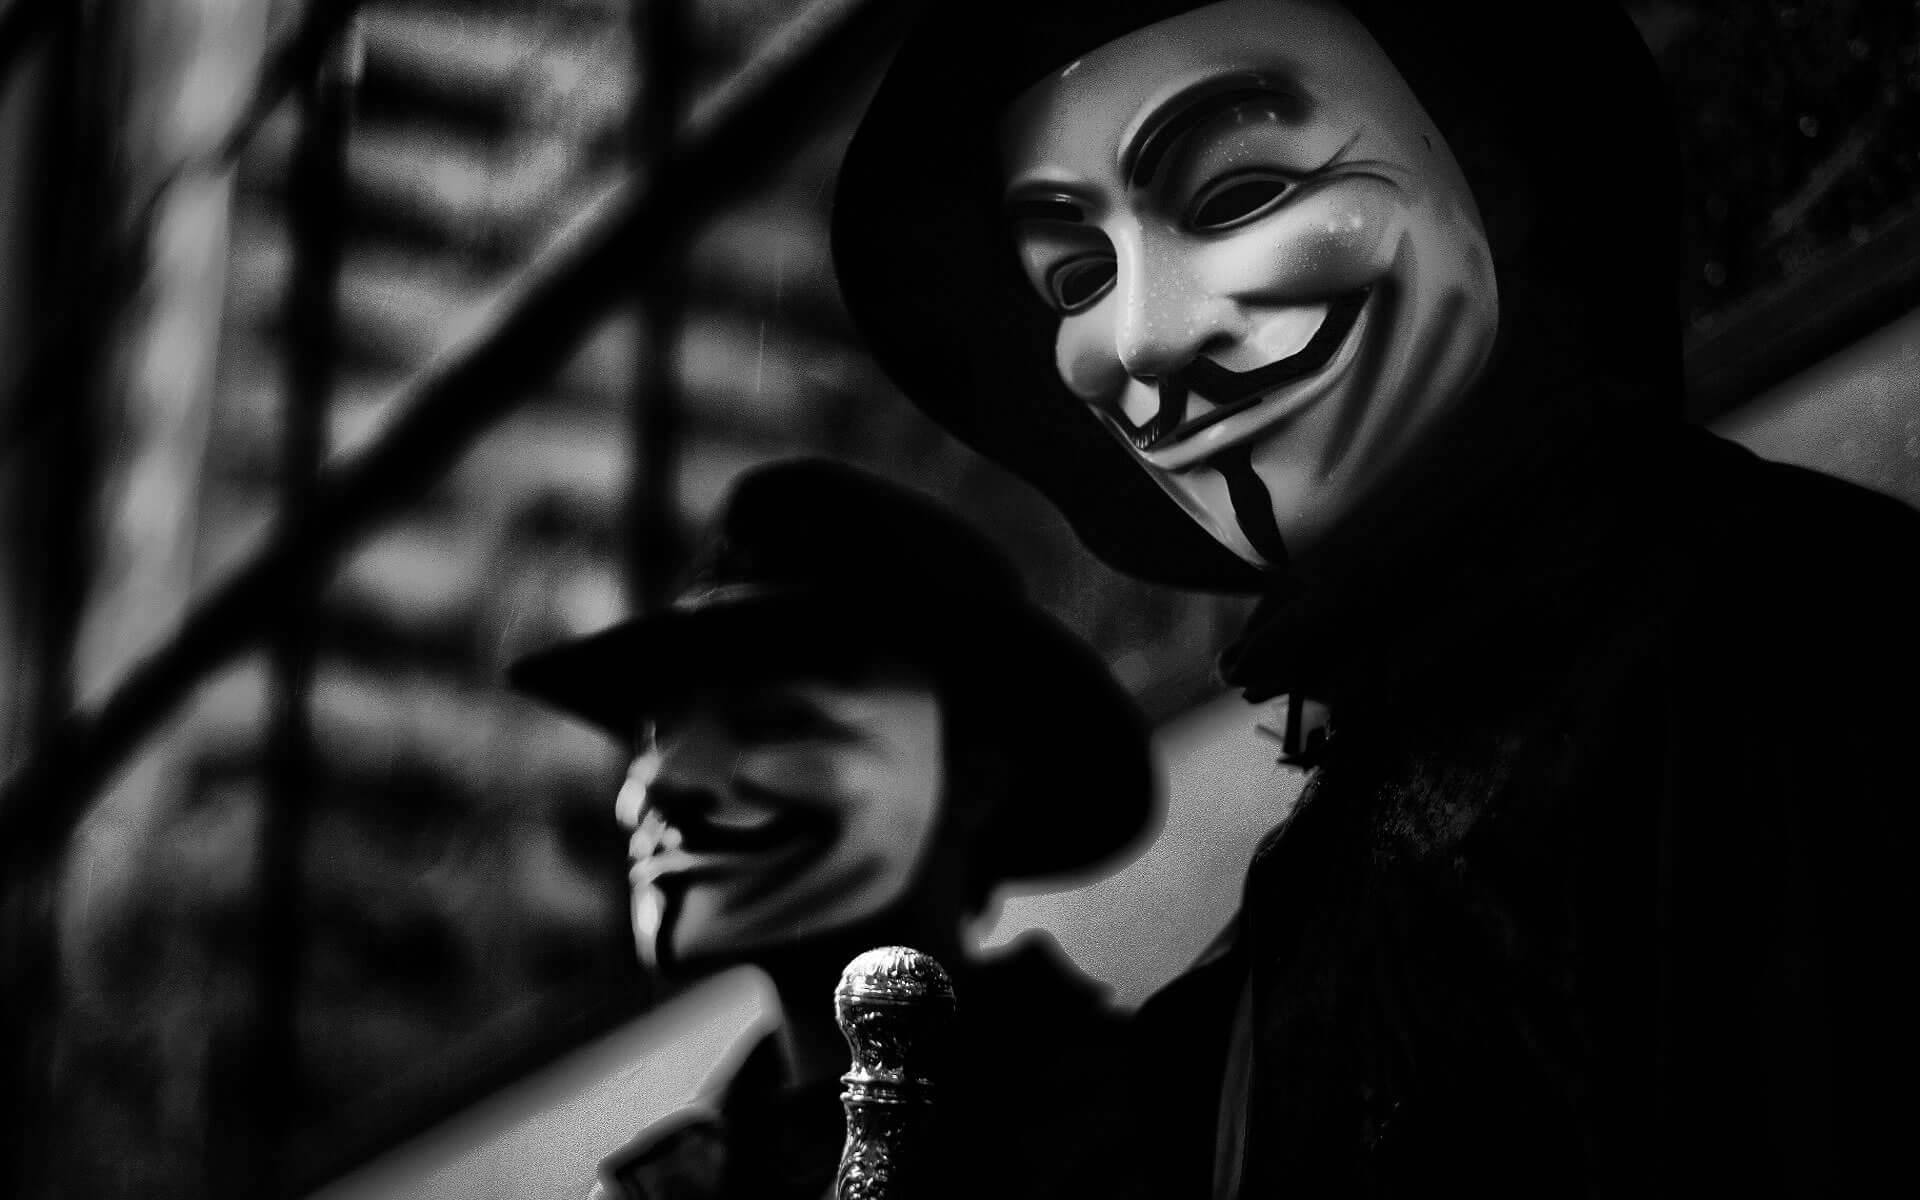 Ảnh mặt nạ Anonymous